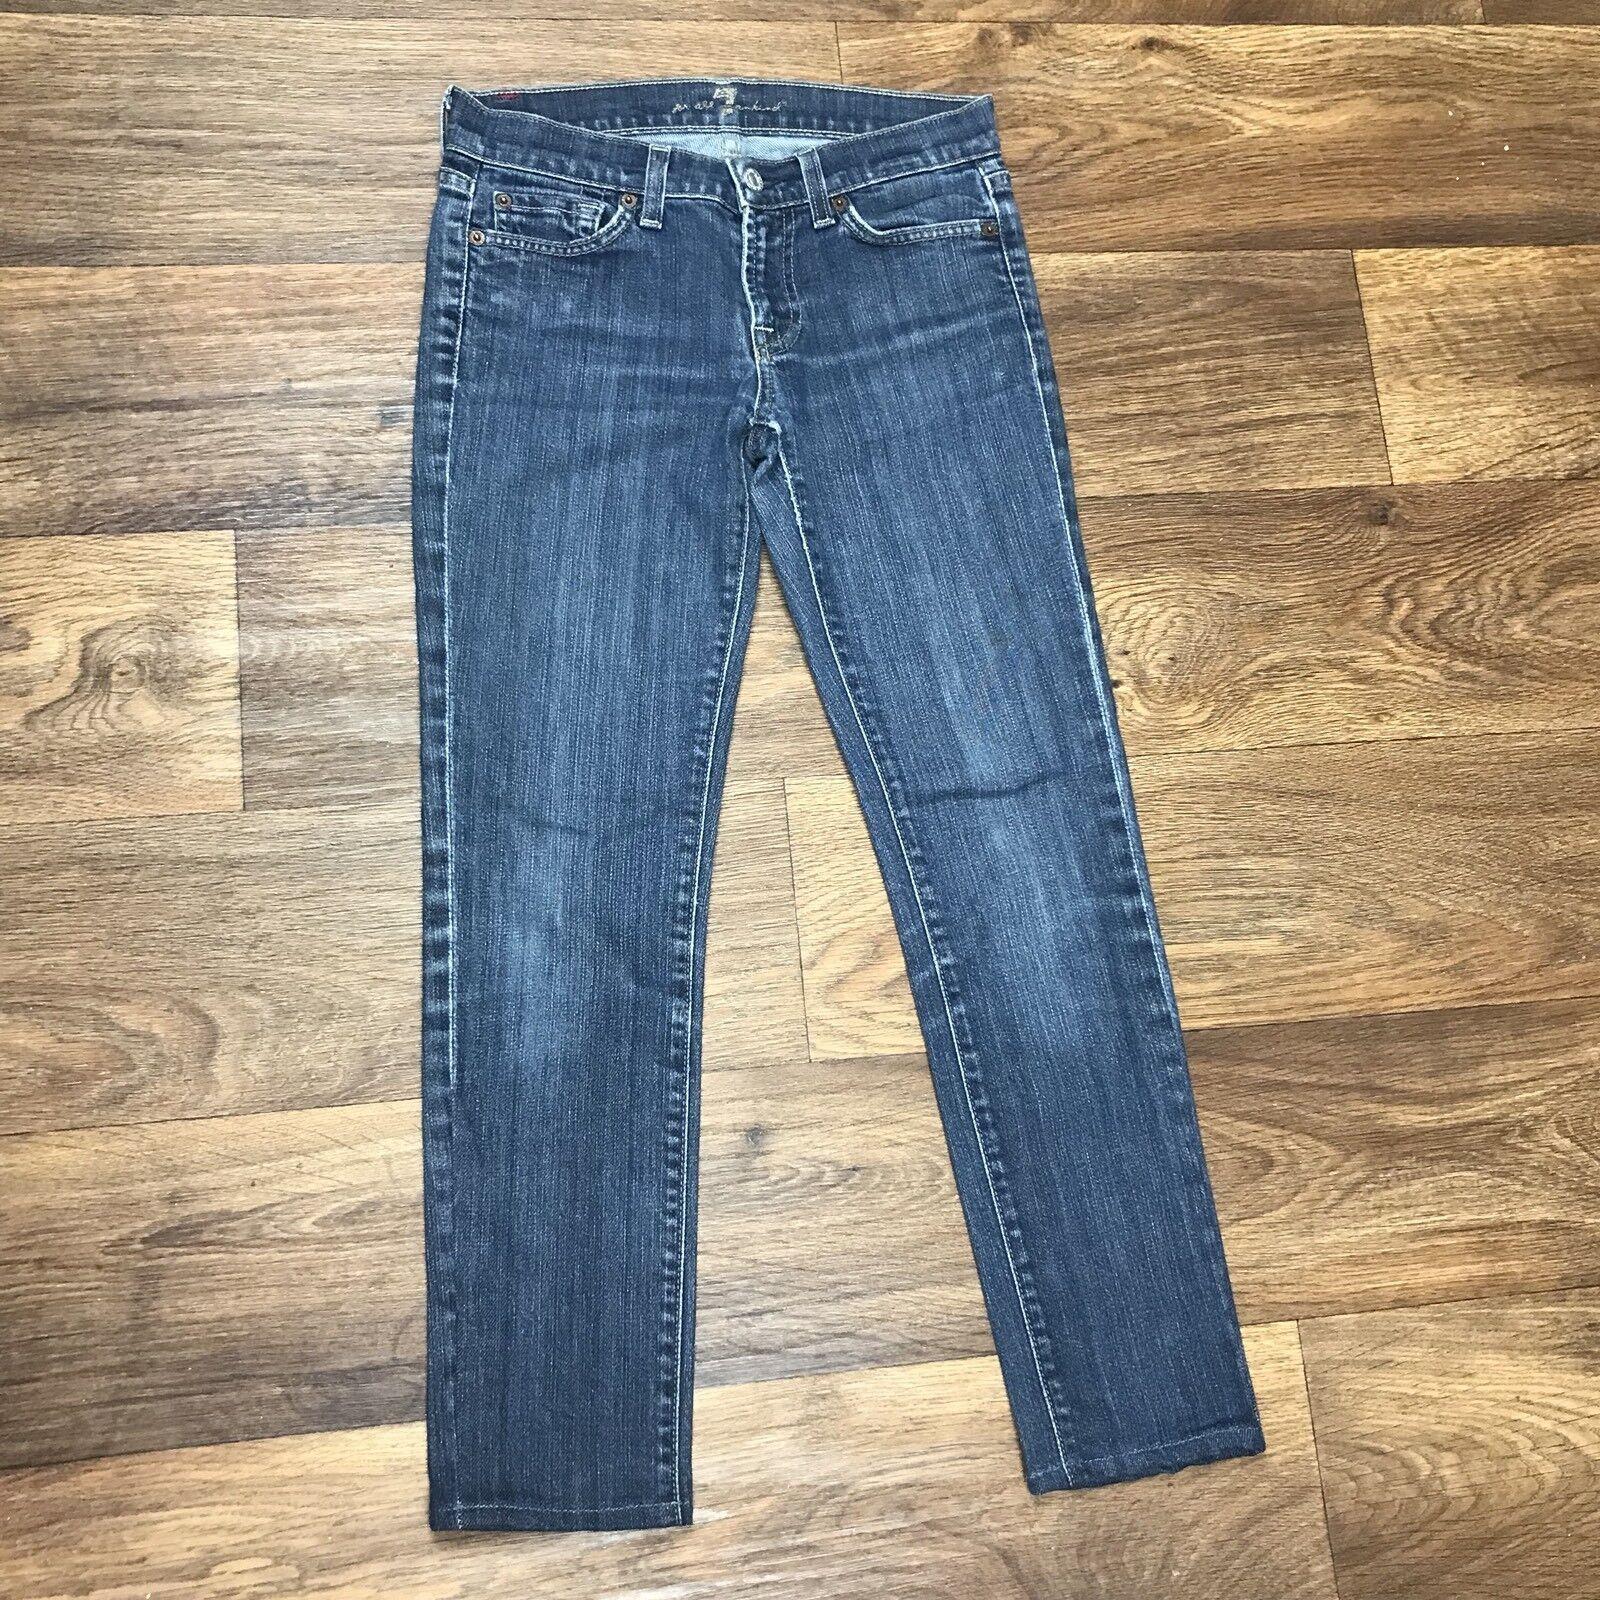 7FAM Sz 25 Seven For All Mankind Roxanne Skinny Stretch Jeans Womens Dark Wash